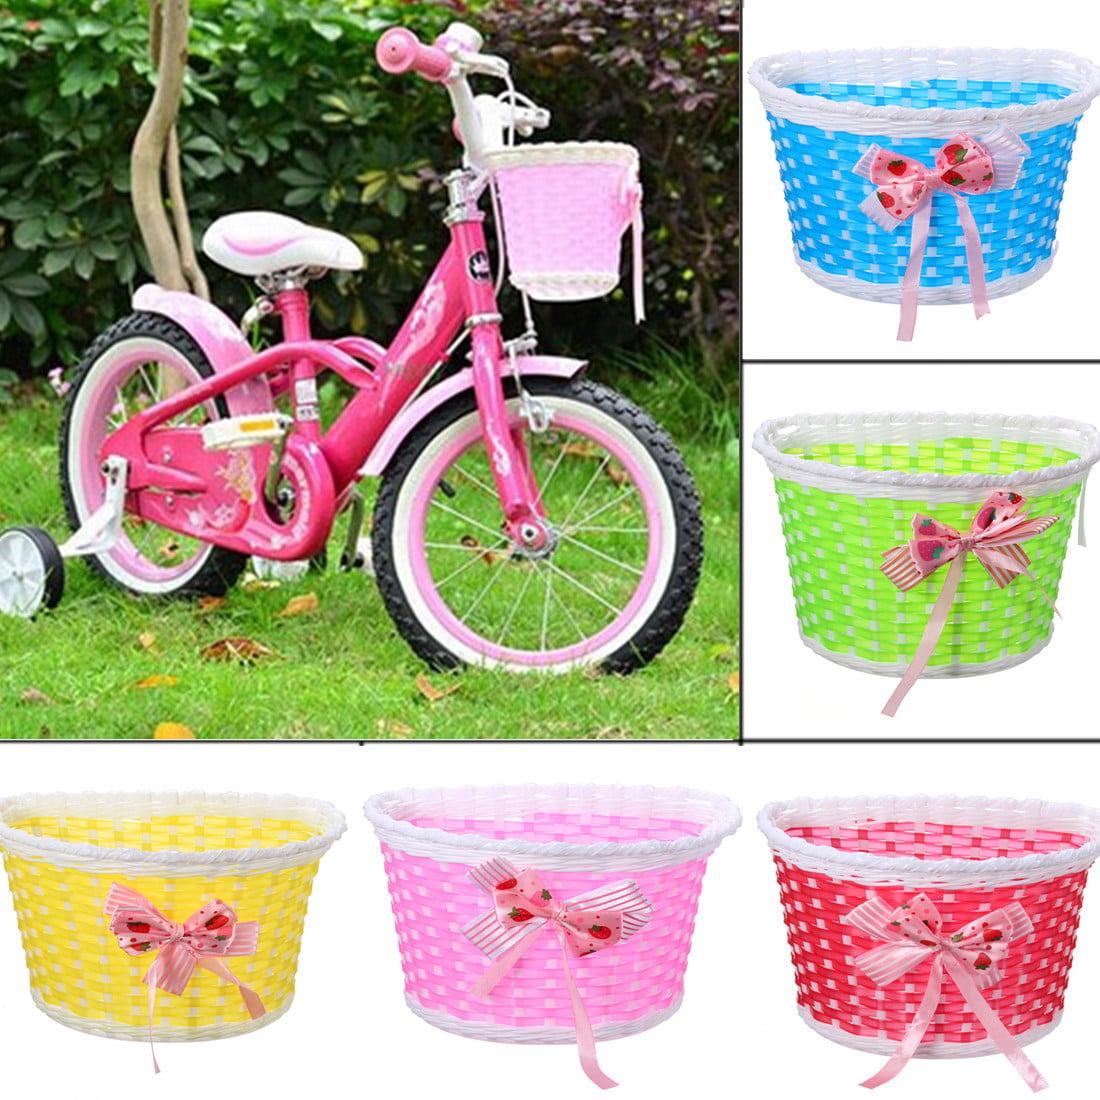 YUJIAN Bicycle Basket Bike Plastic Storage Basket Bicycle Basket Front Handlebar Basket Portable Shopping Basket for Women and Children